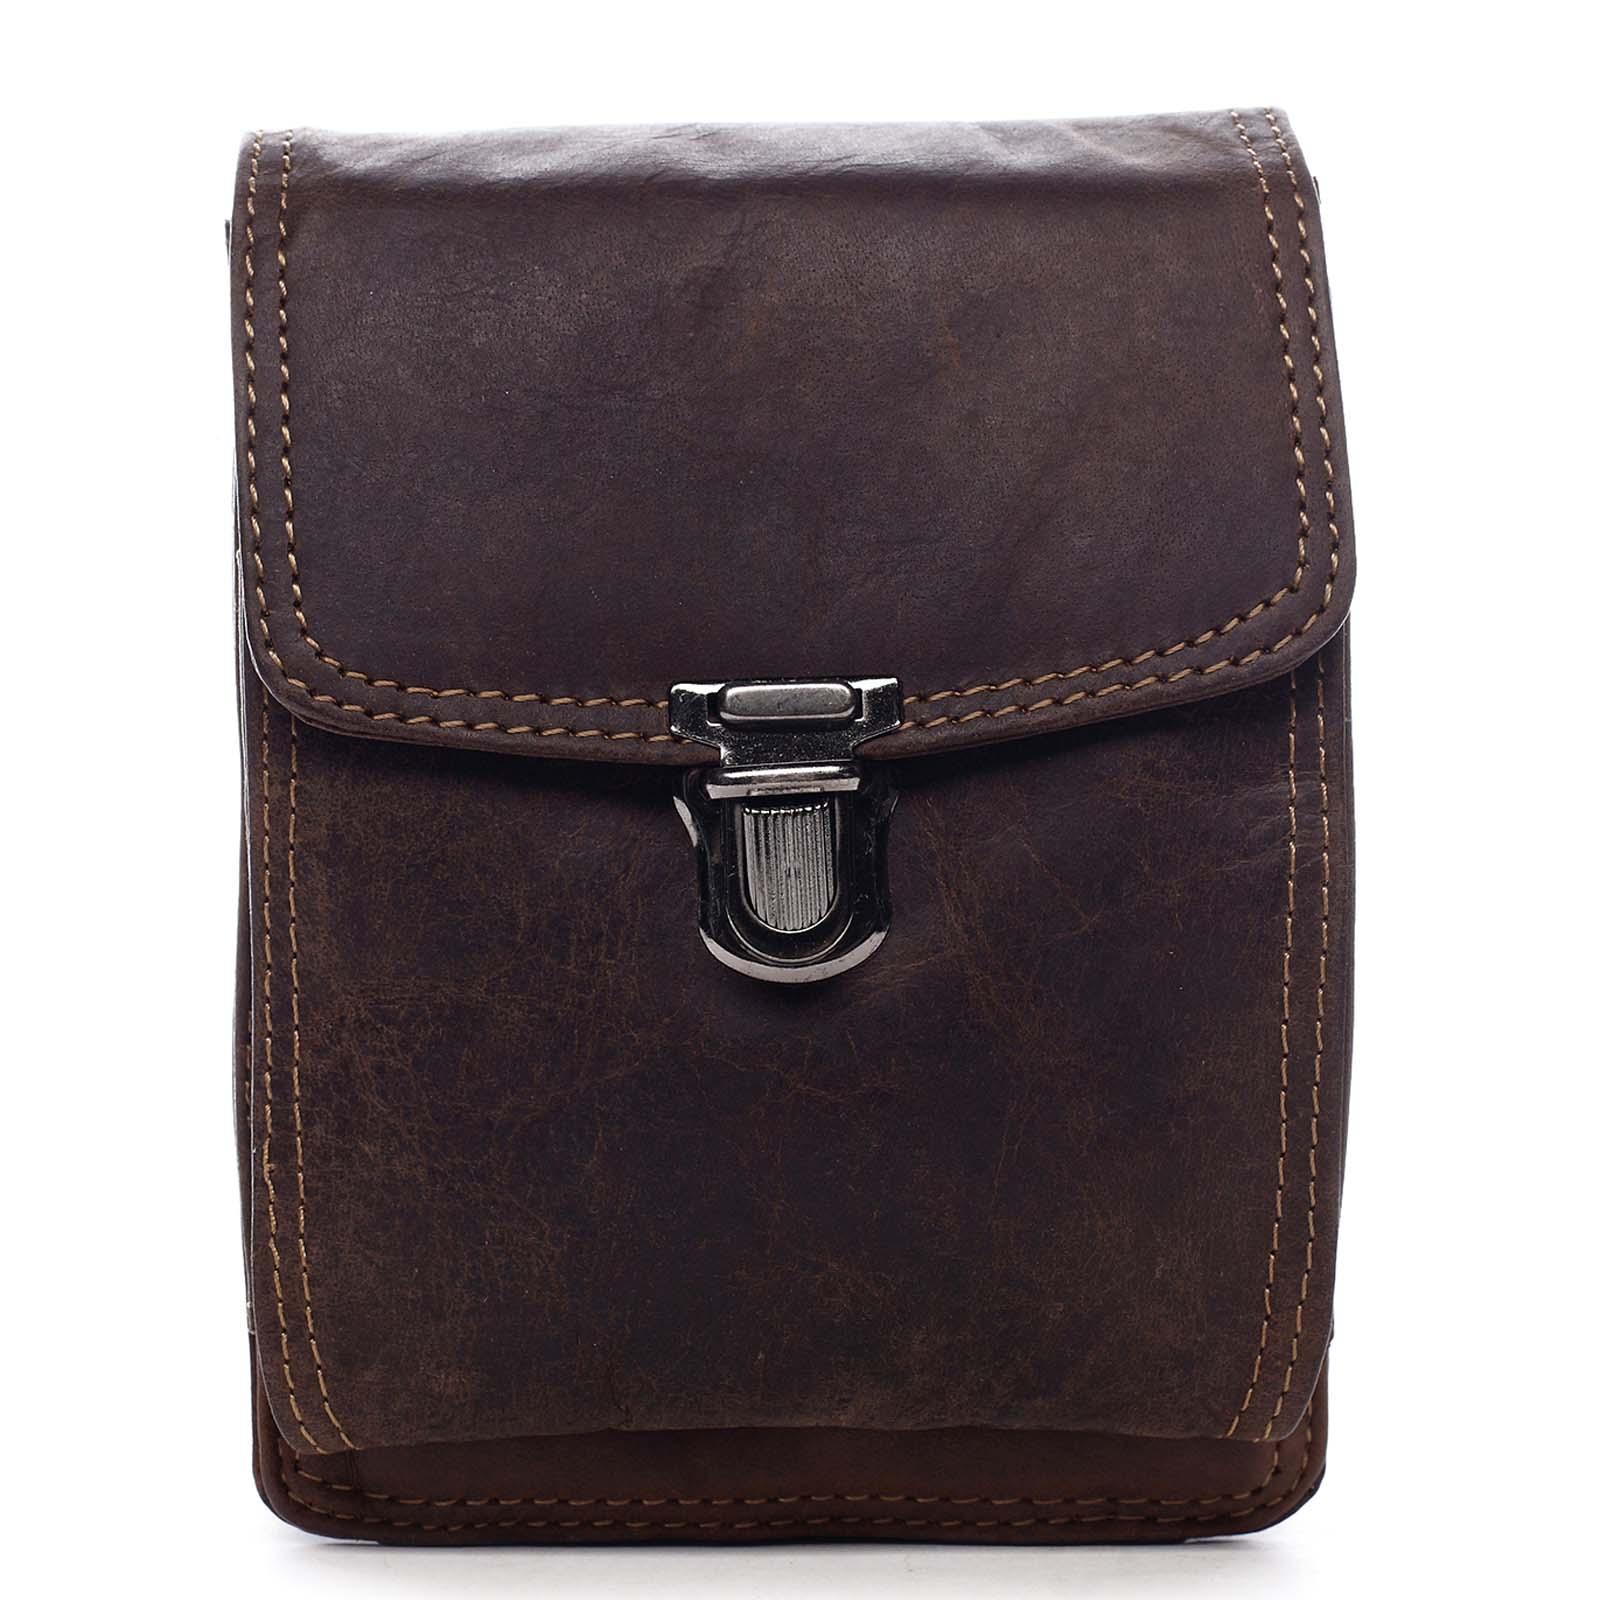 Luxusná pánska kožená vrecko na opasok hnedá - Greenwood Surprise hnedá